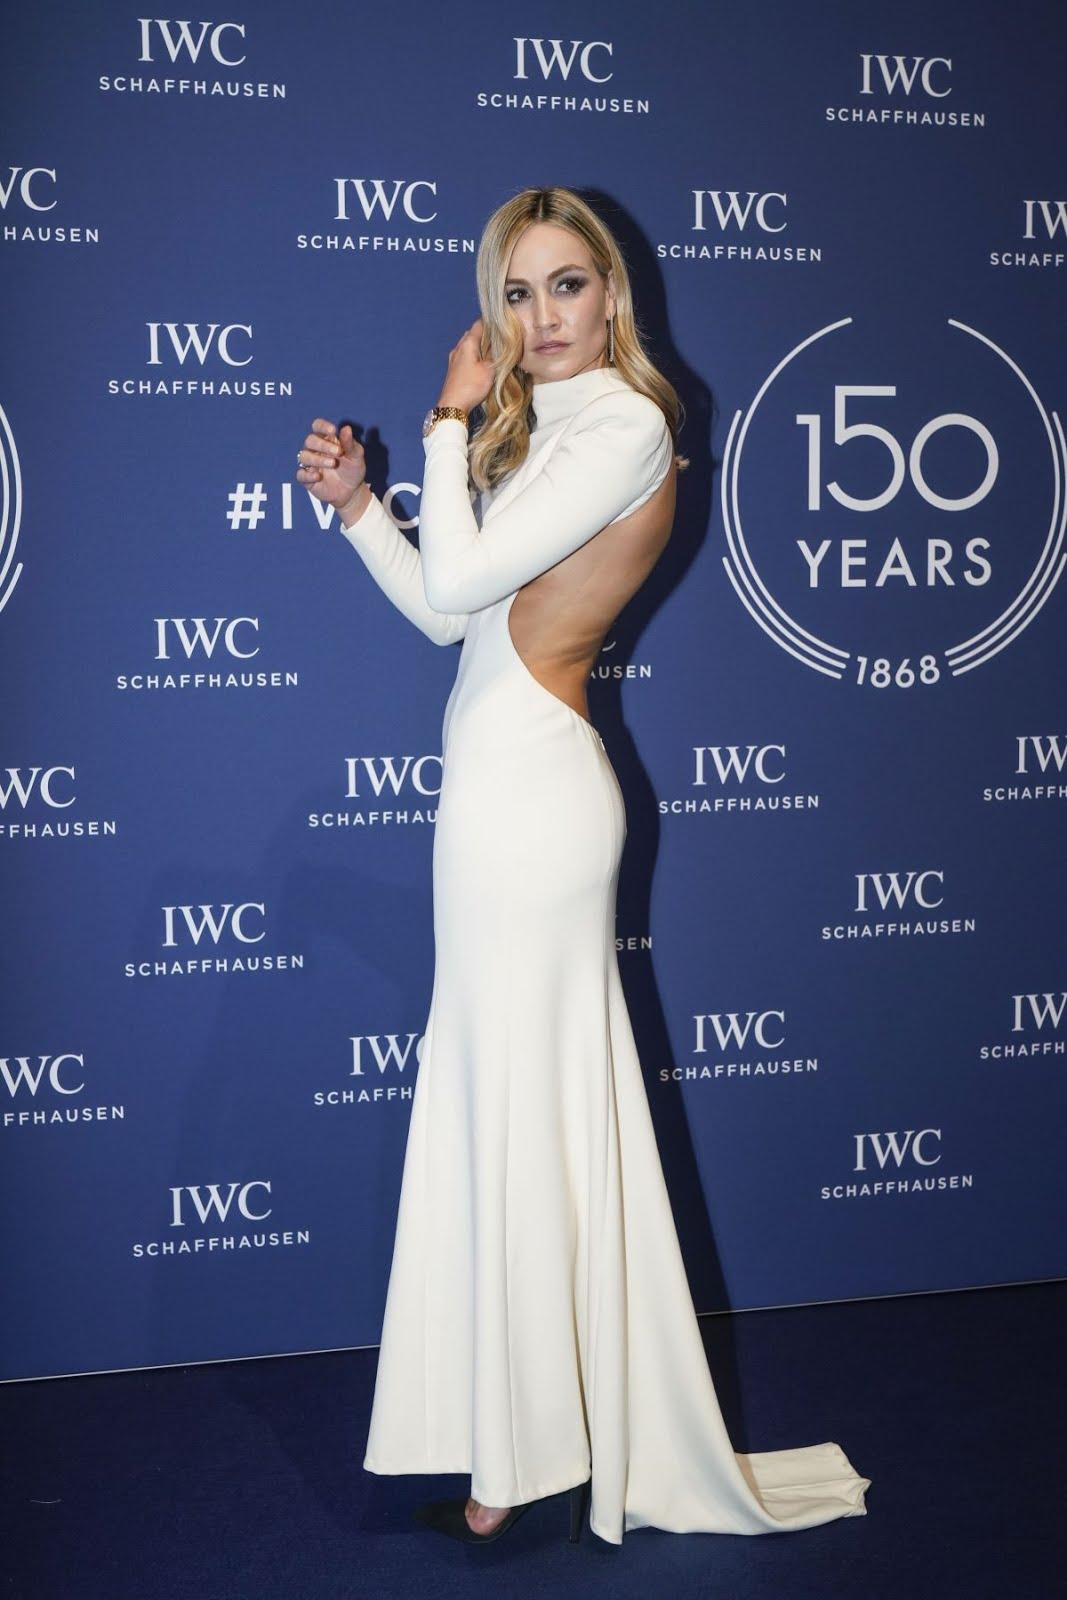 HD Wallpapers & Photos of HOT Carmen Jorda At IWC Schaffhausen Gala At Sihh 2018 in Geneva